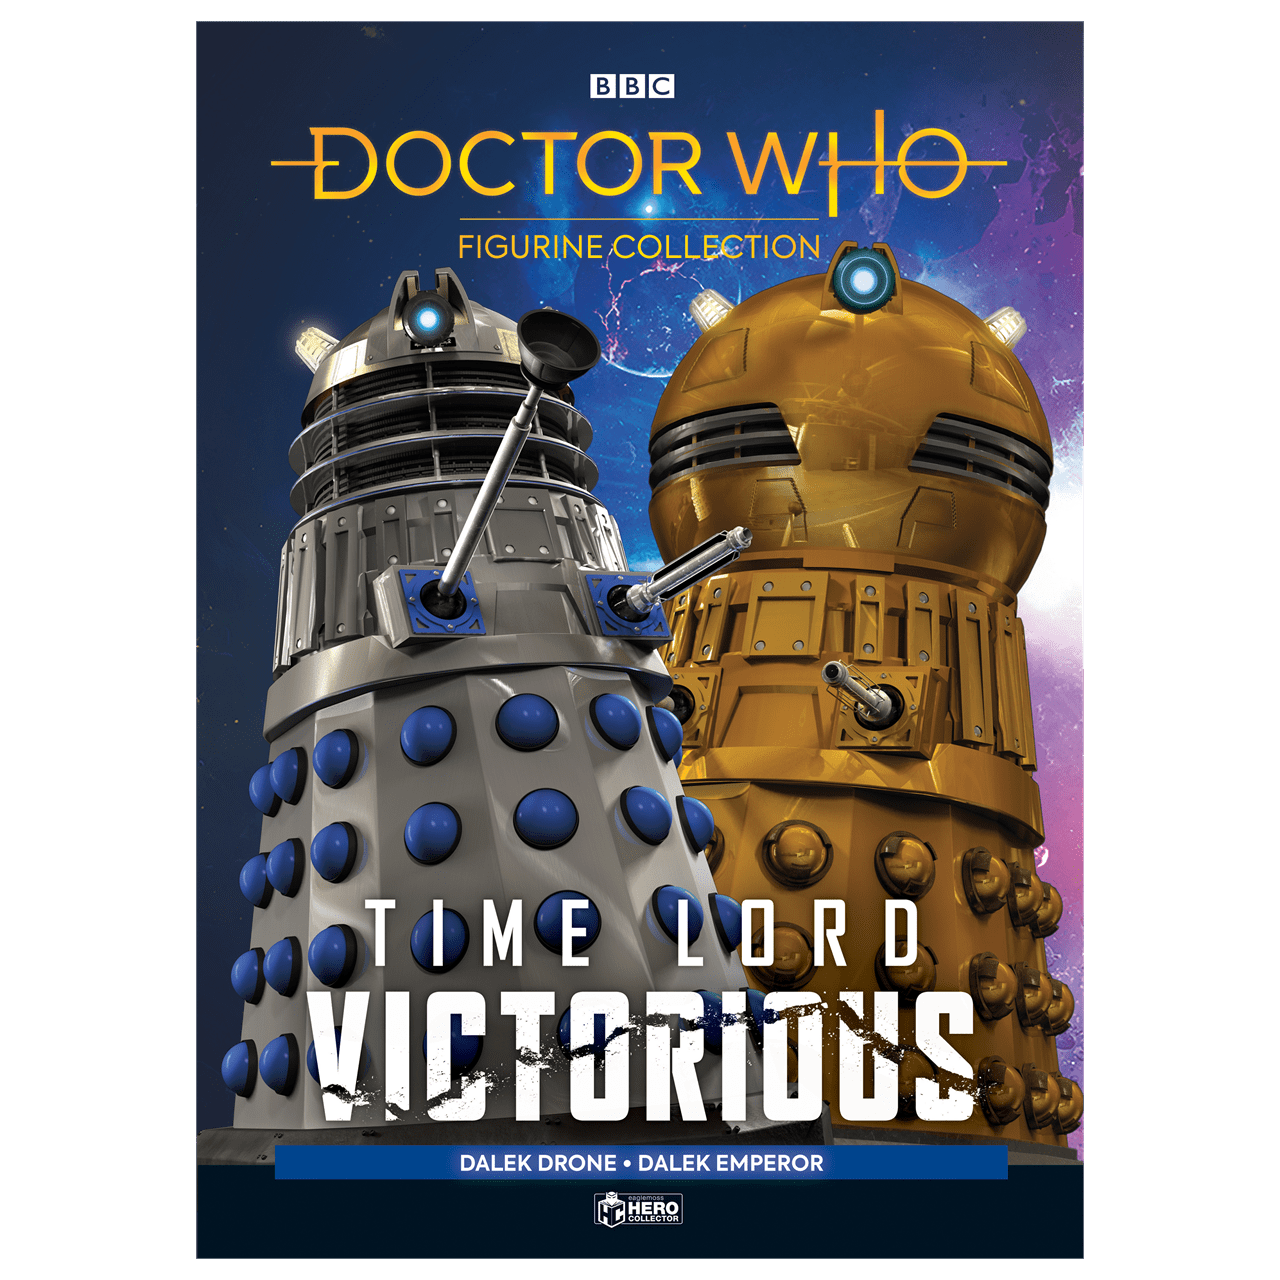 Doctor Who: Dalek Drone and Dalek Emperor Figurine Set: Hero Collector - 6